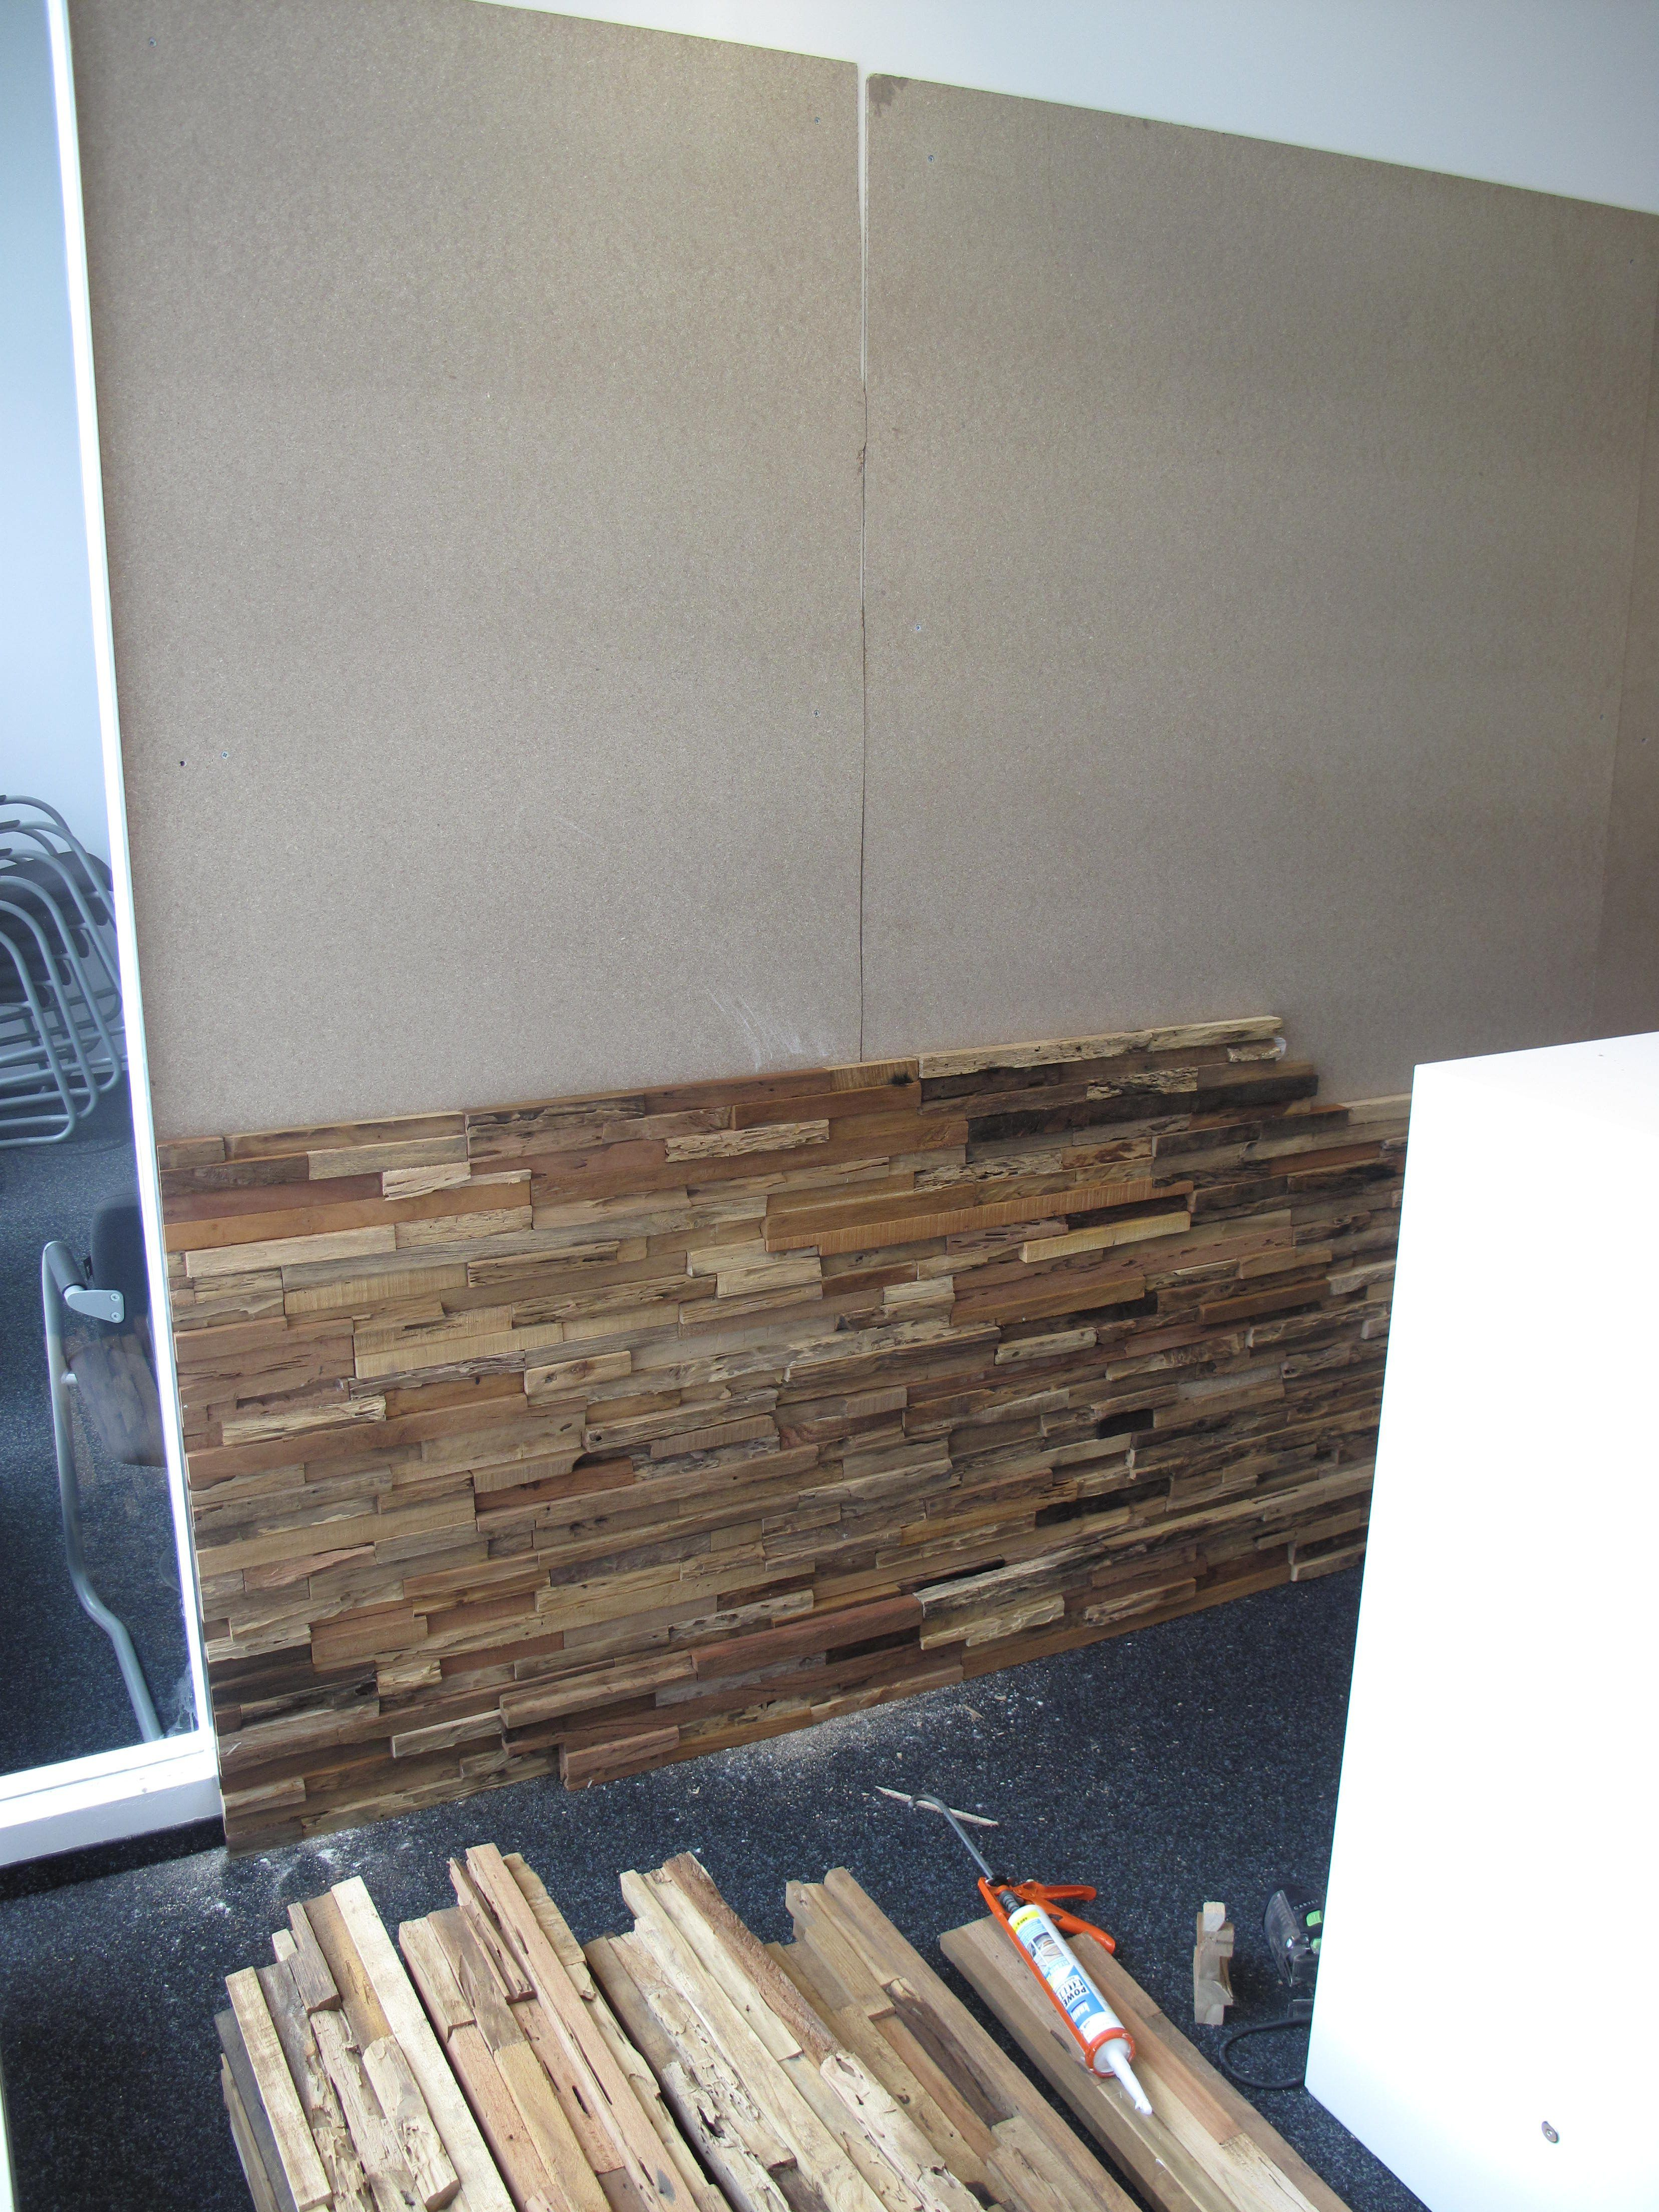 Montage Wandverkleidung Paneele Wandverkleidung Holz Wandverkleidung Holzdeko Wand